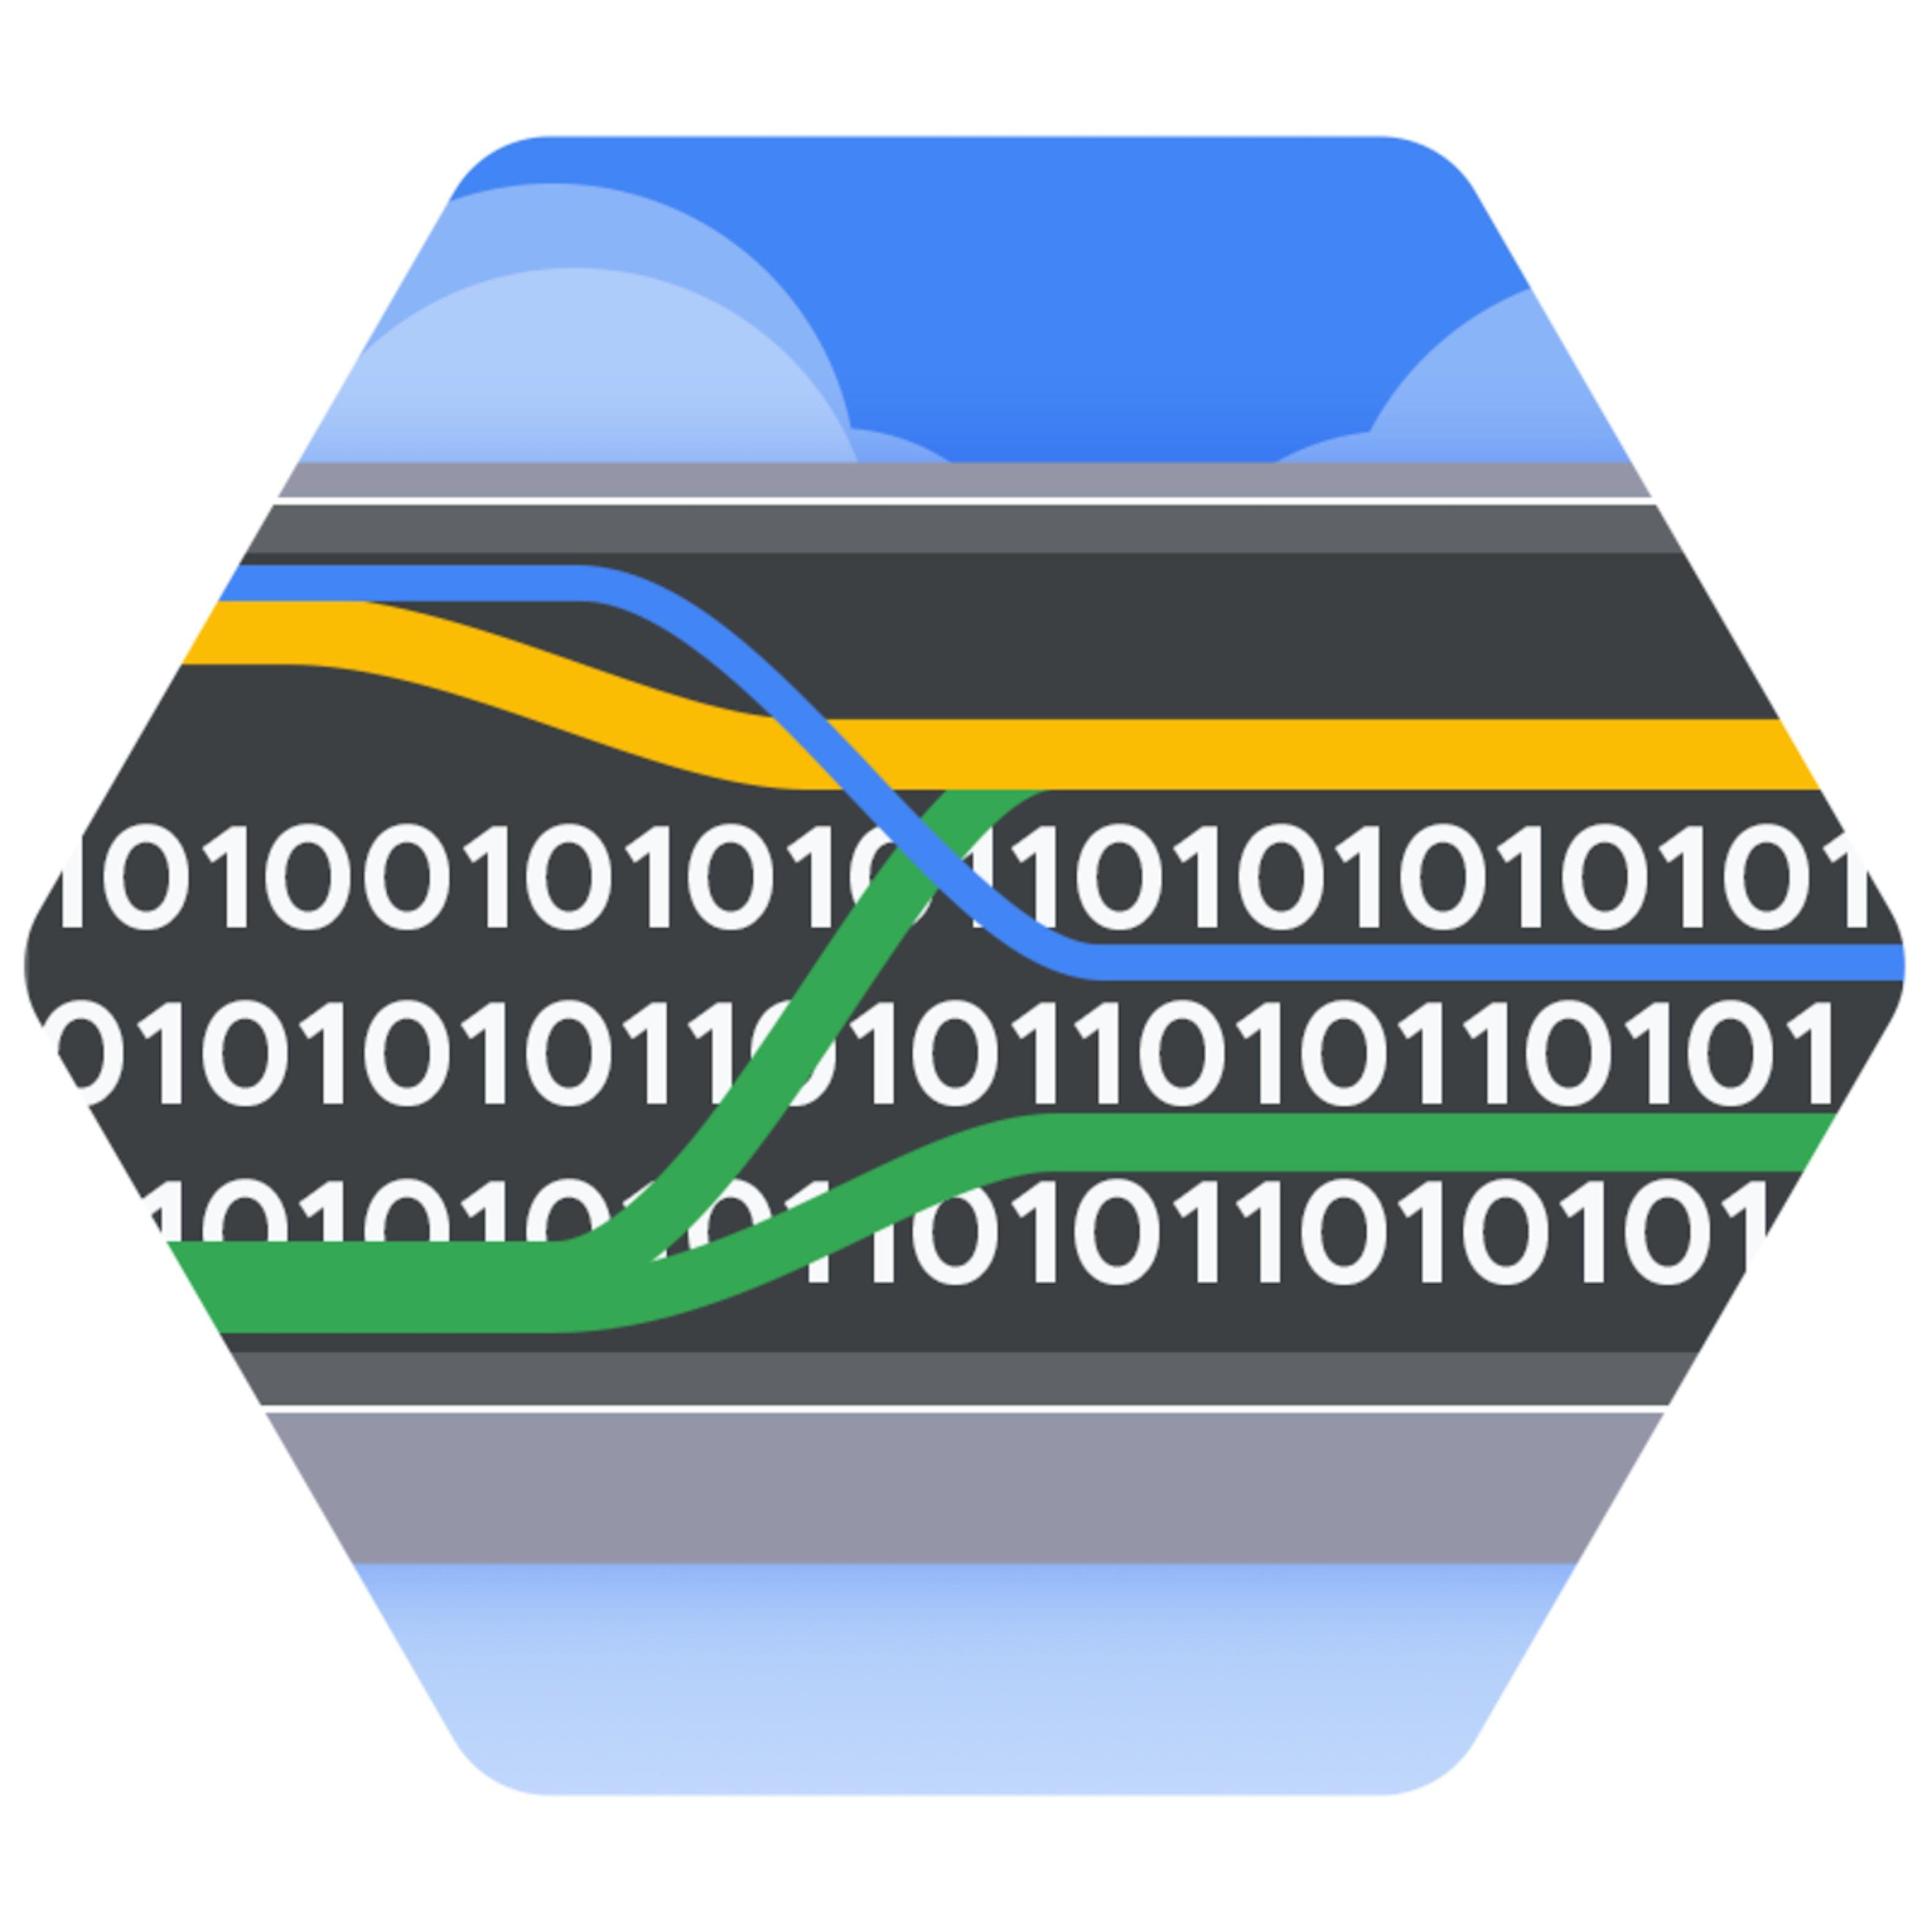 Preparing for the Google Cloud Professional Data Engineer